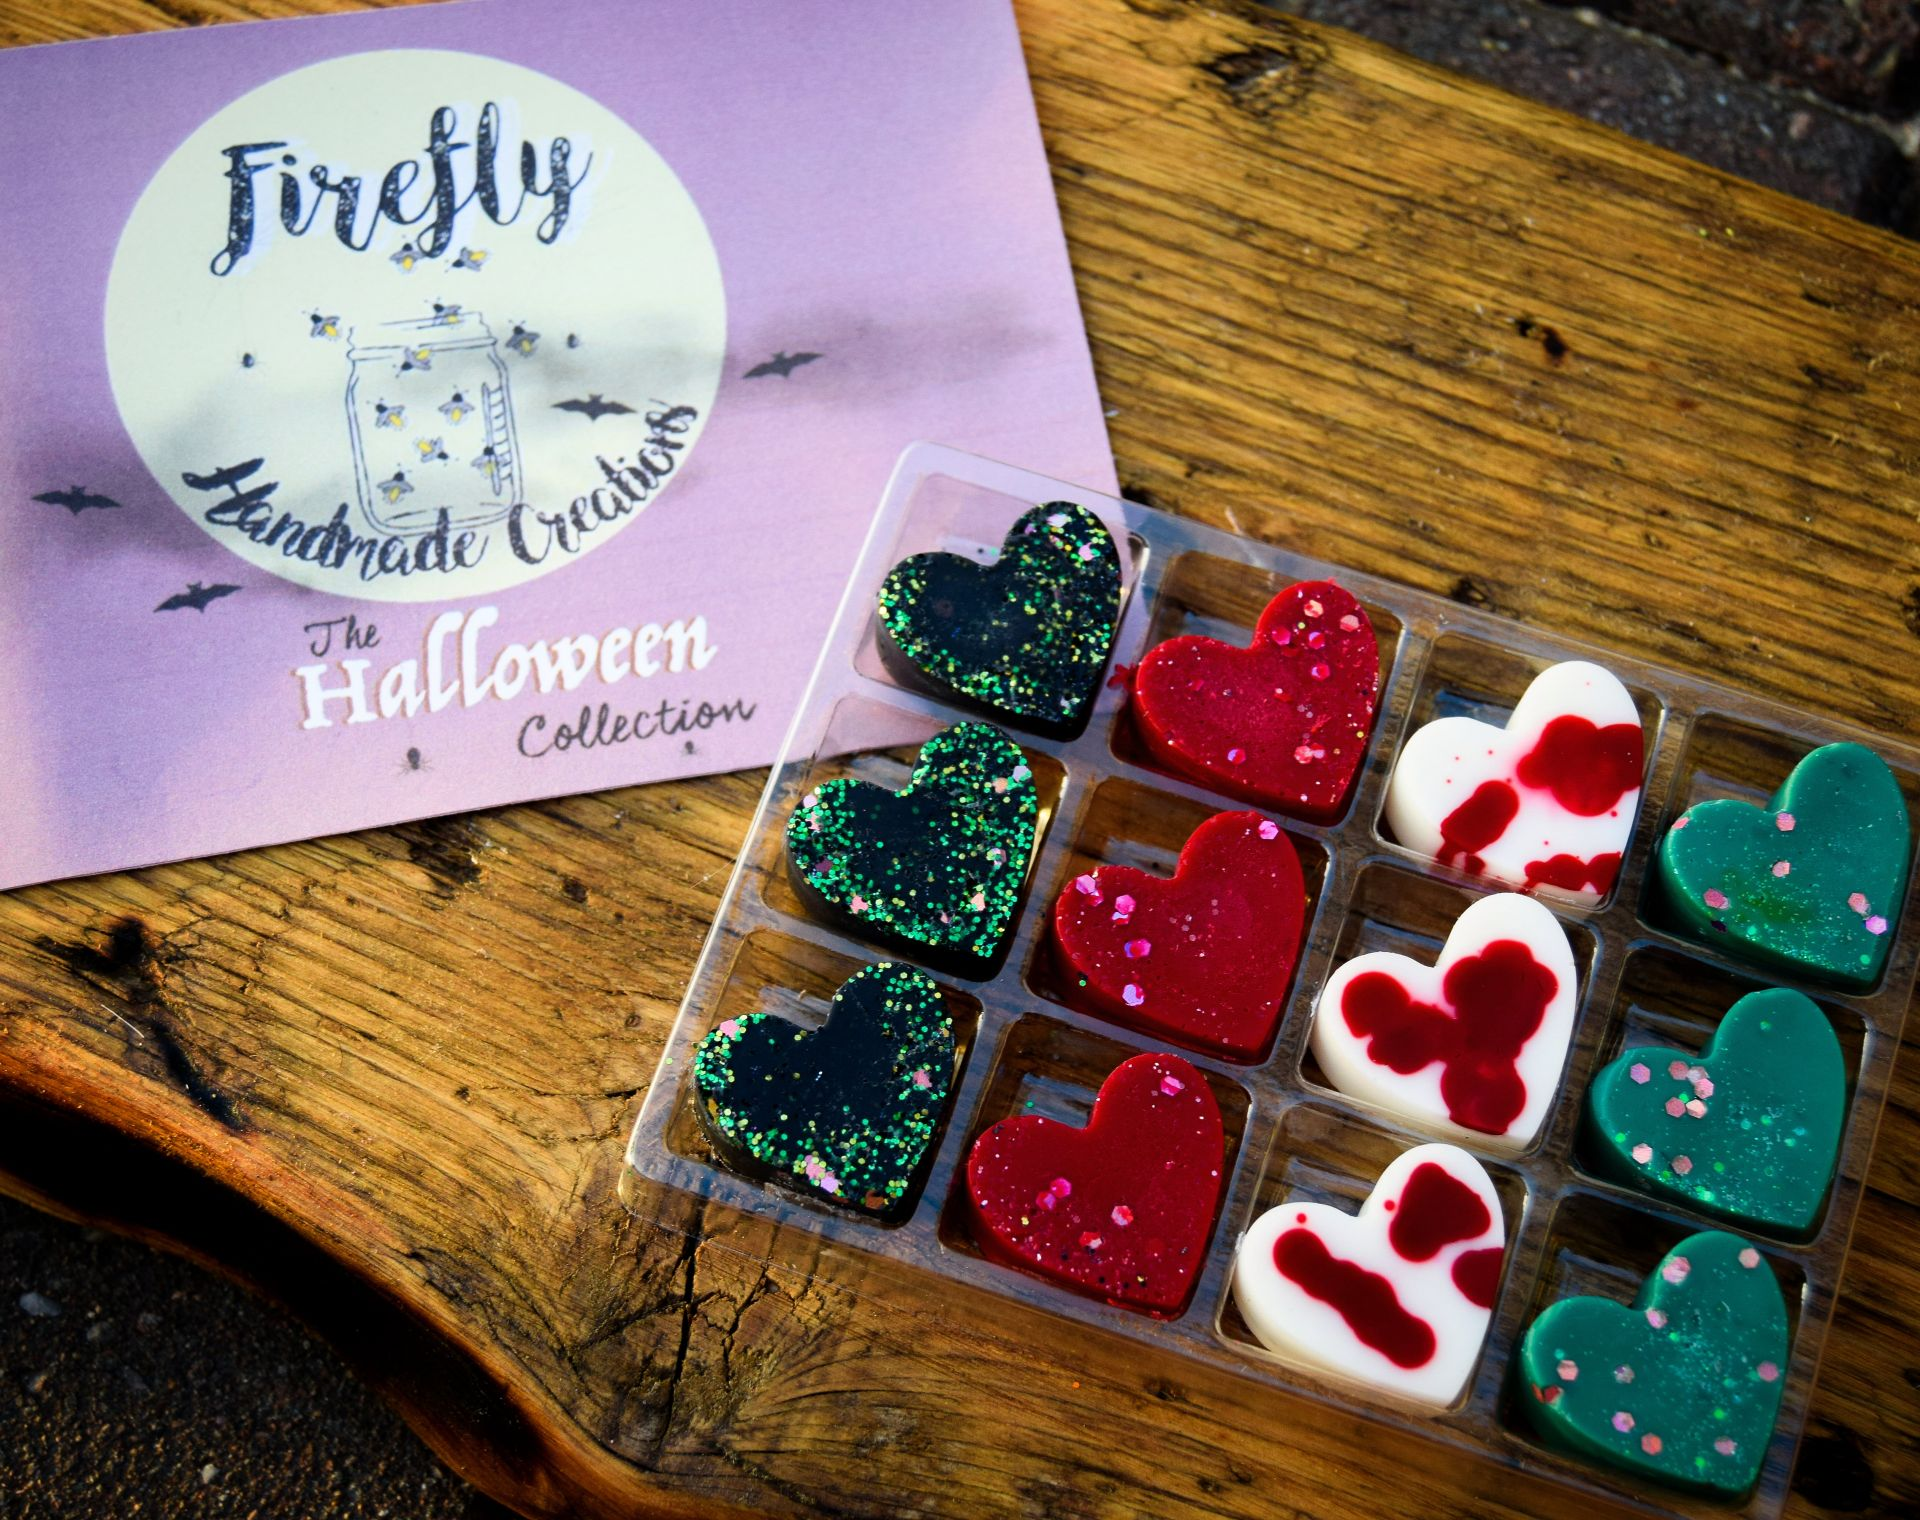 Member Profile - Firefly Handmade Shop